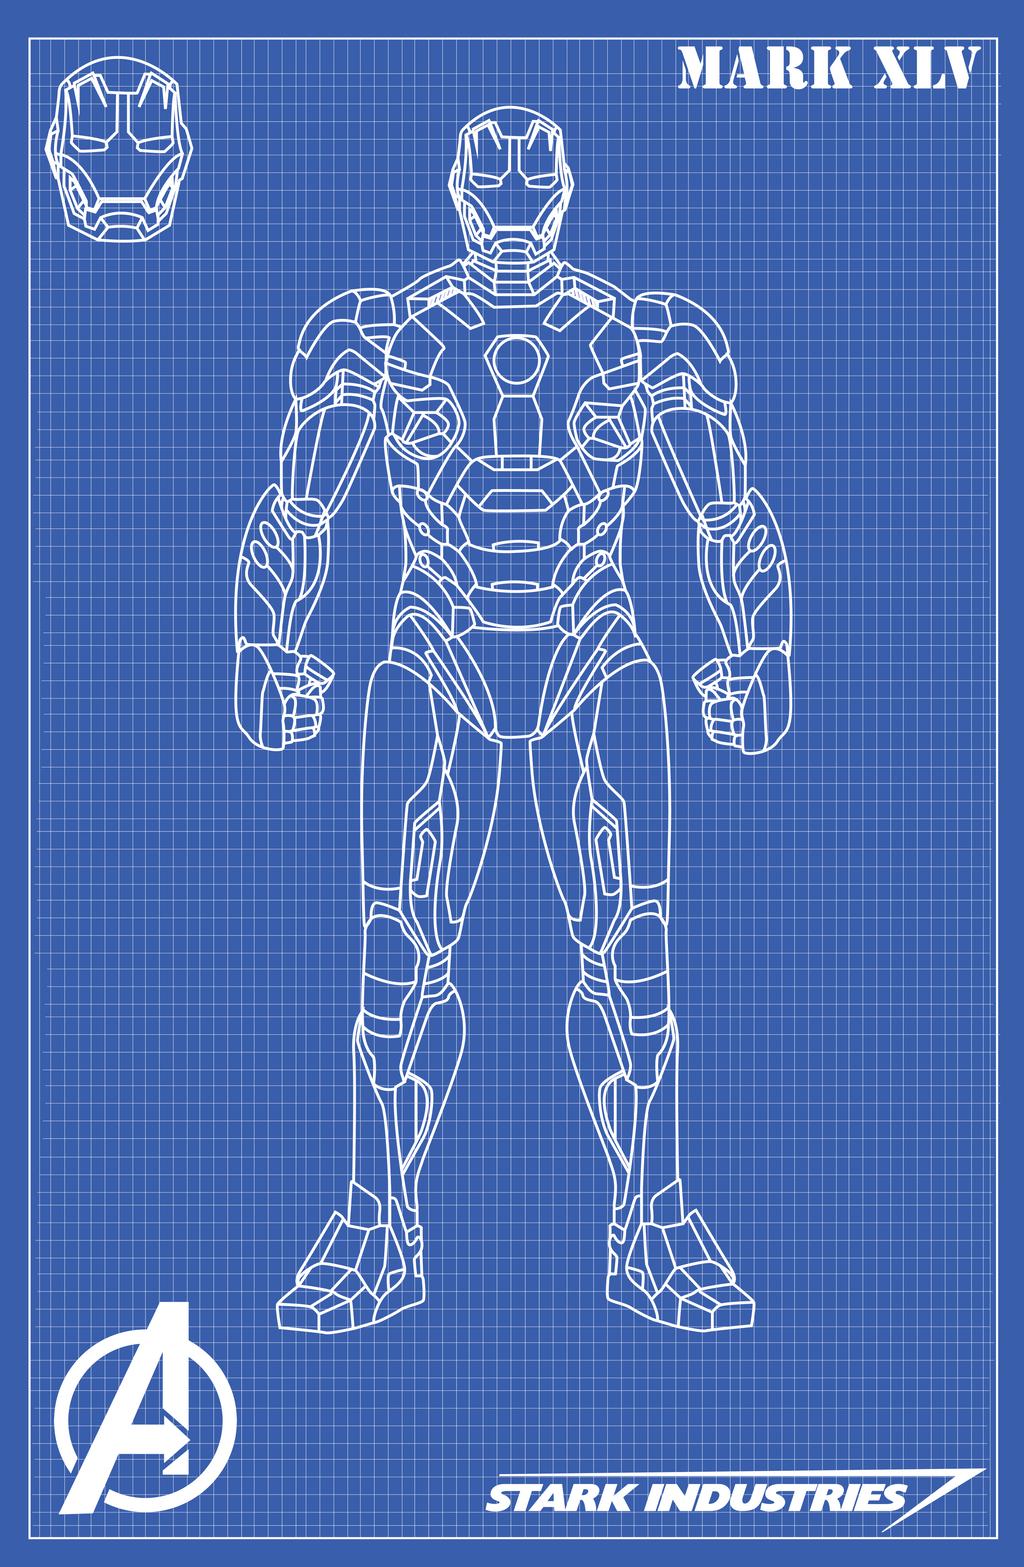 Iron man mark xlv blueprints by nickgonzales7 on deviantart for Plan d iron man